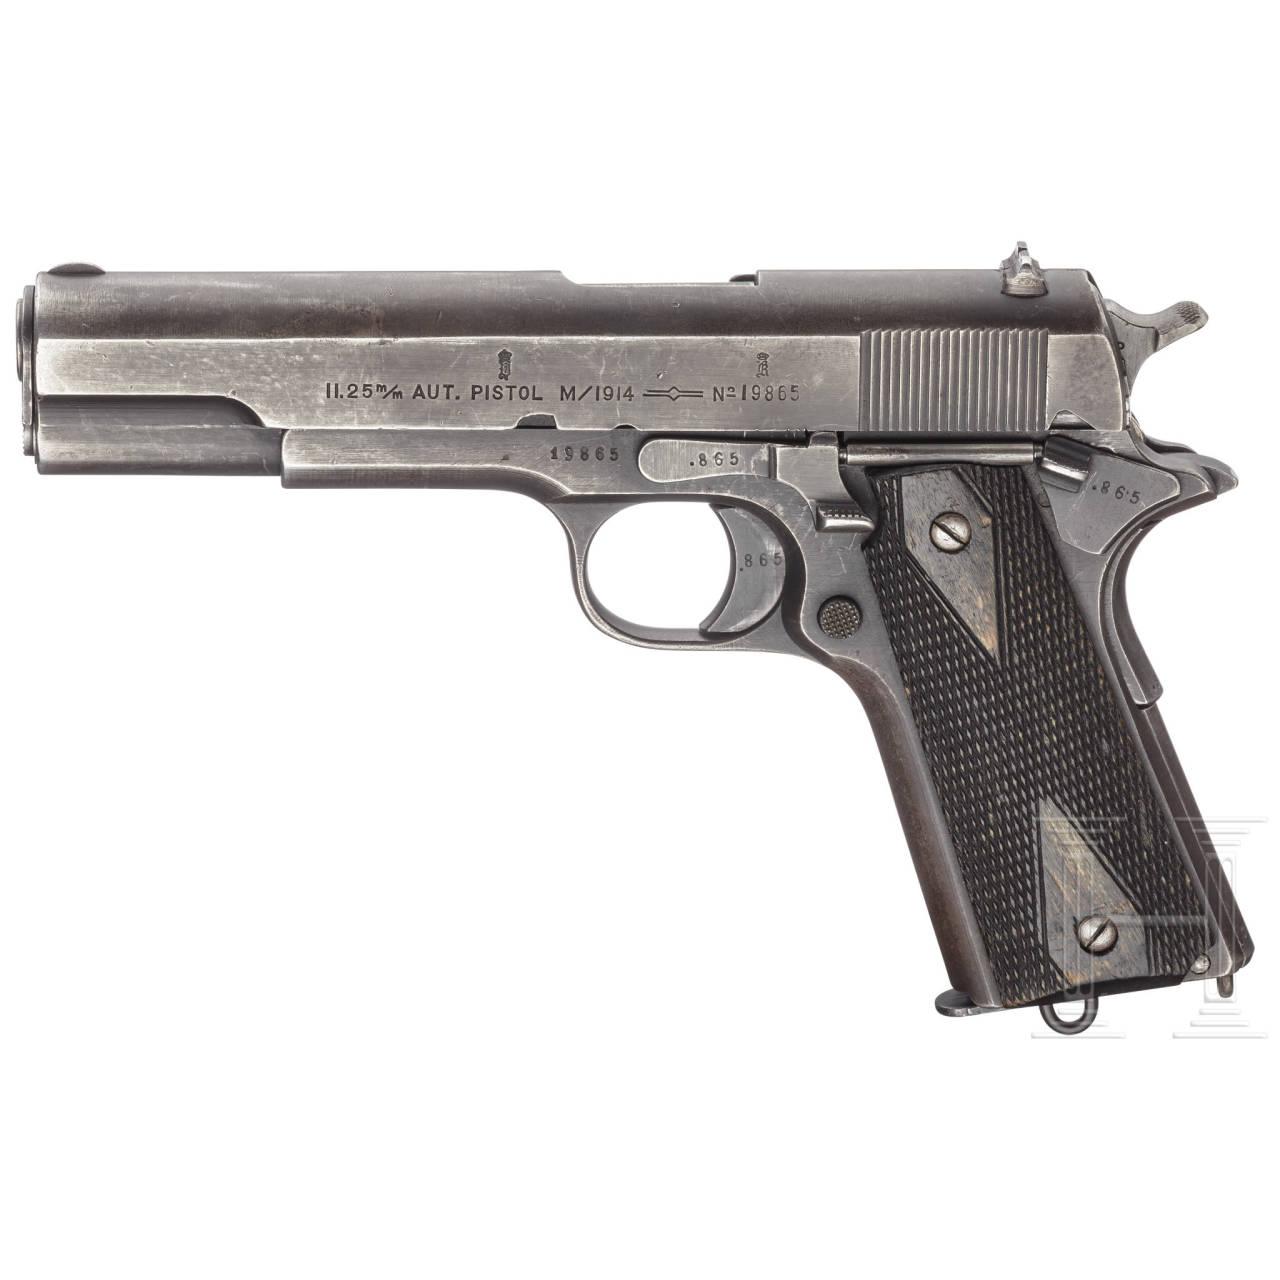 A Colt Kongsberg Model 1914